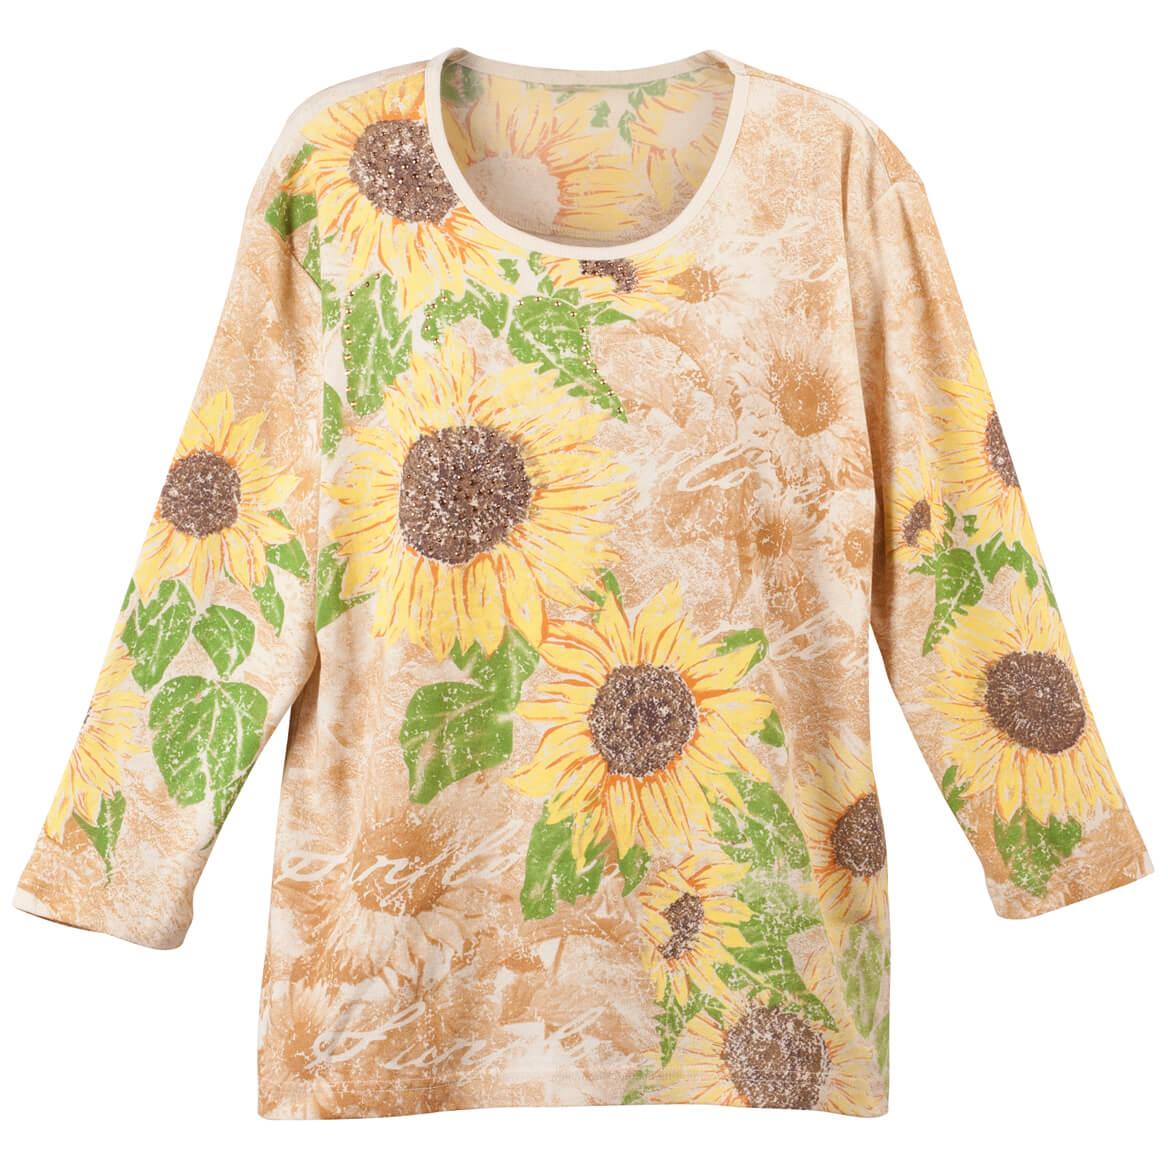 Sunflowers 3/4 Sleeve Top